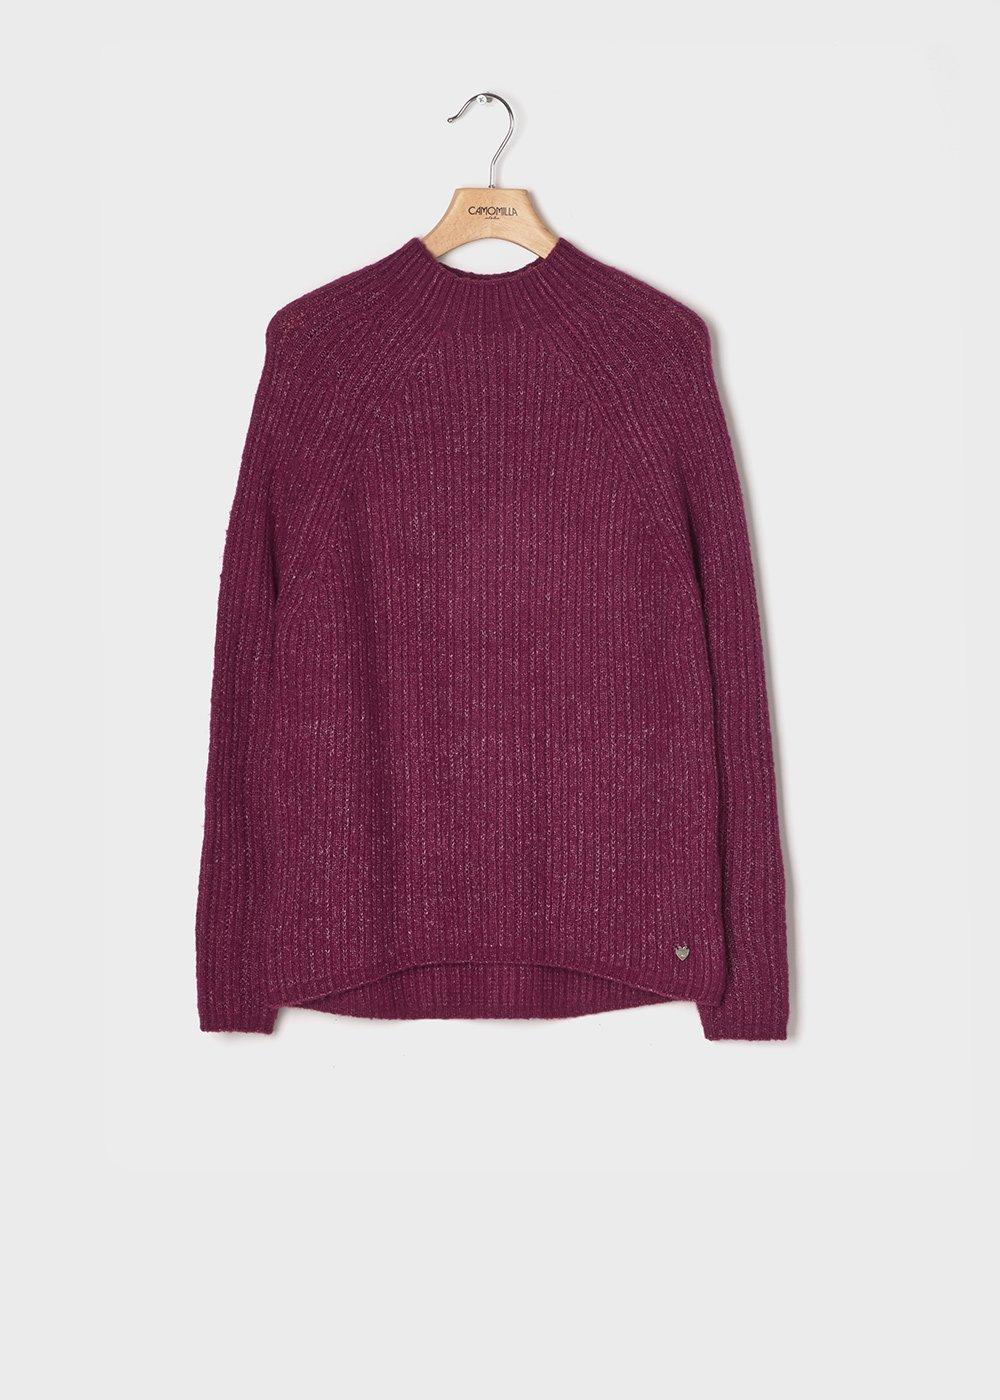 Manuela ribbed sweater - Magnolia - Woman